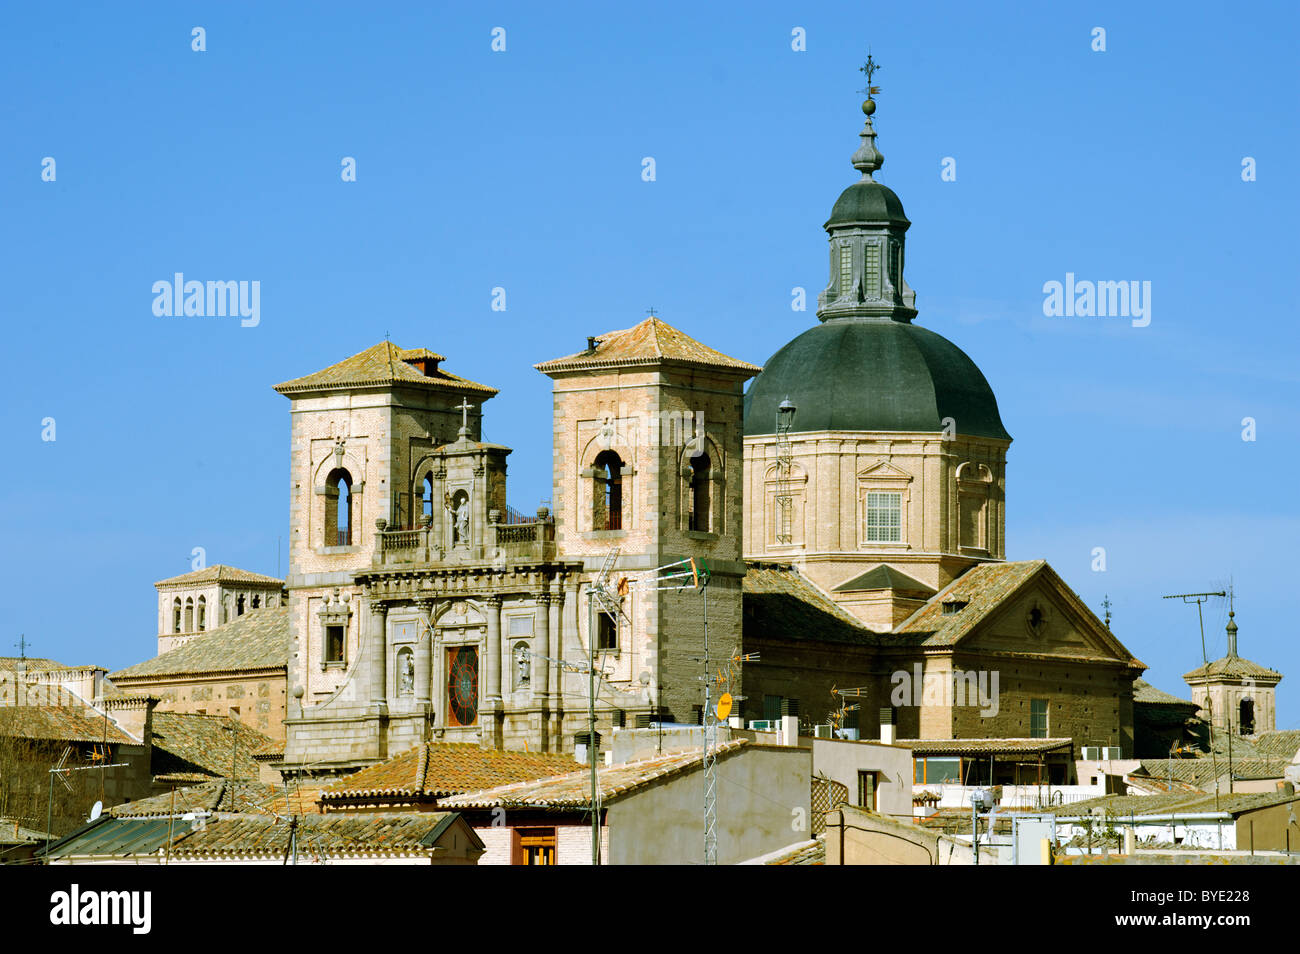 San Ildefonso, Toledo, Castile-La Mancha, Spain, Europe - Stock Image